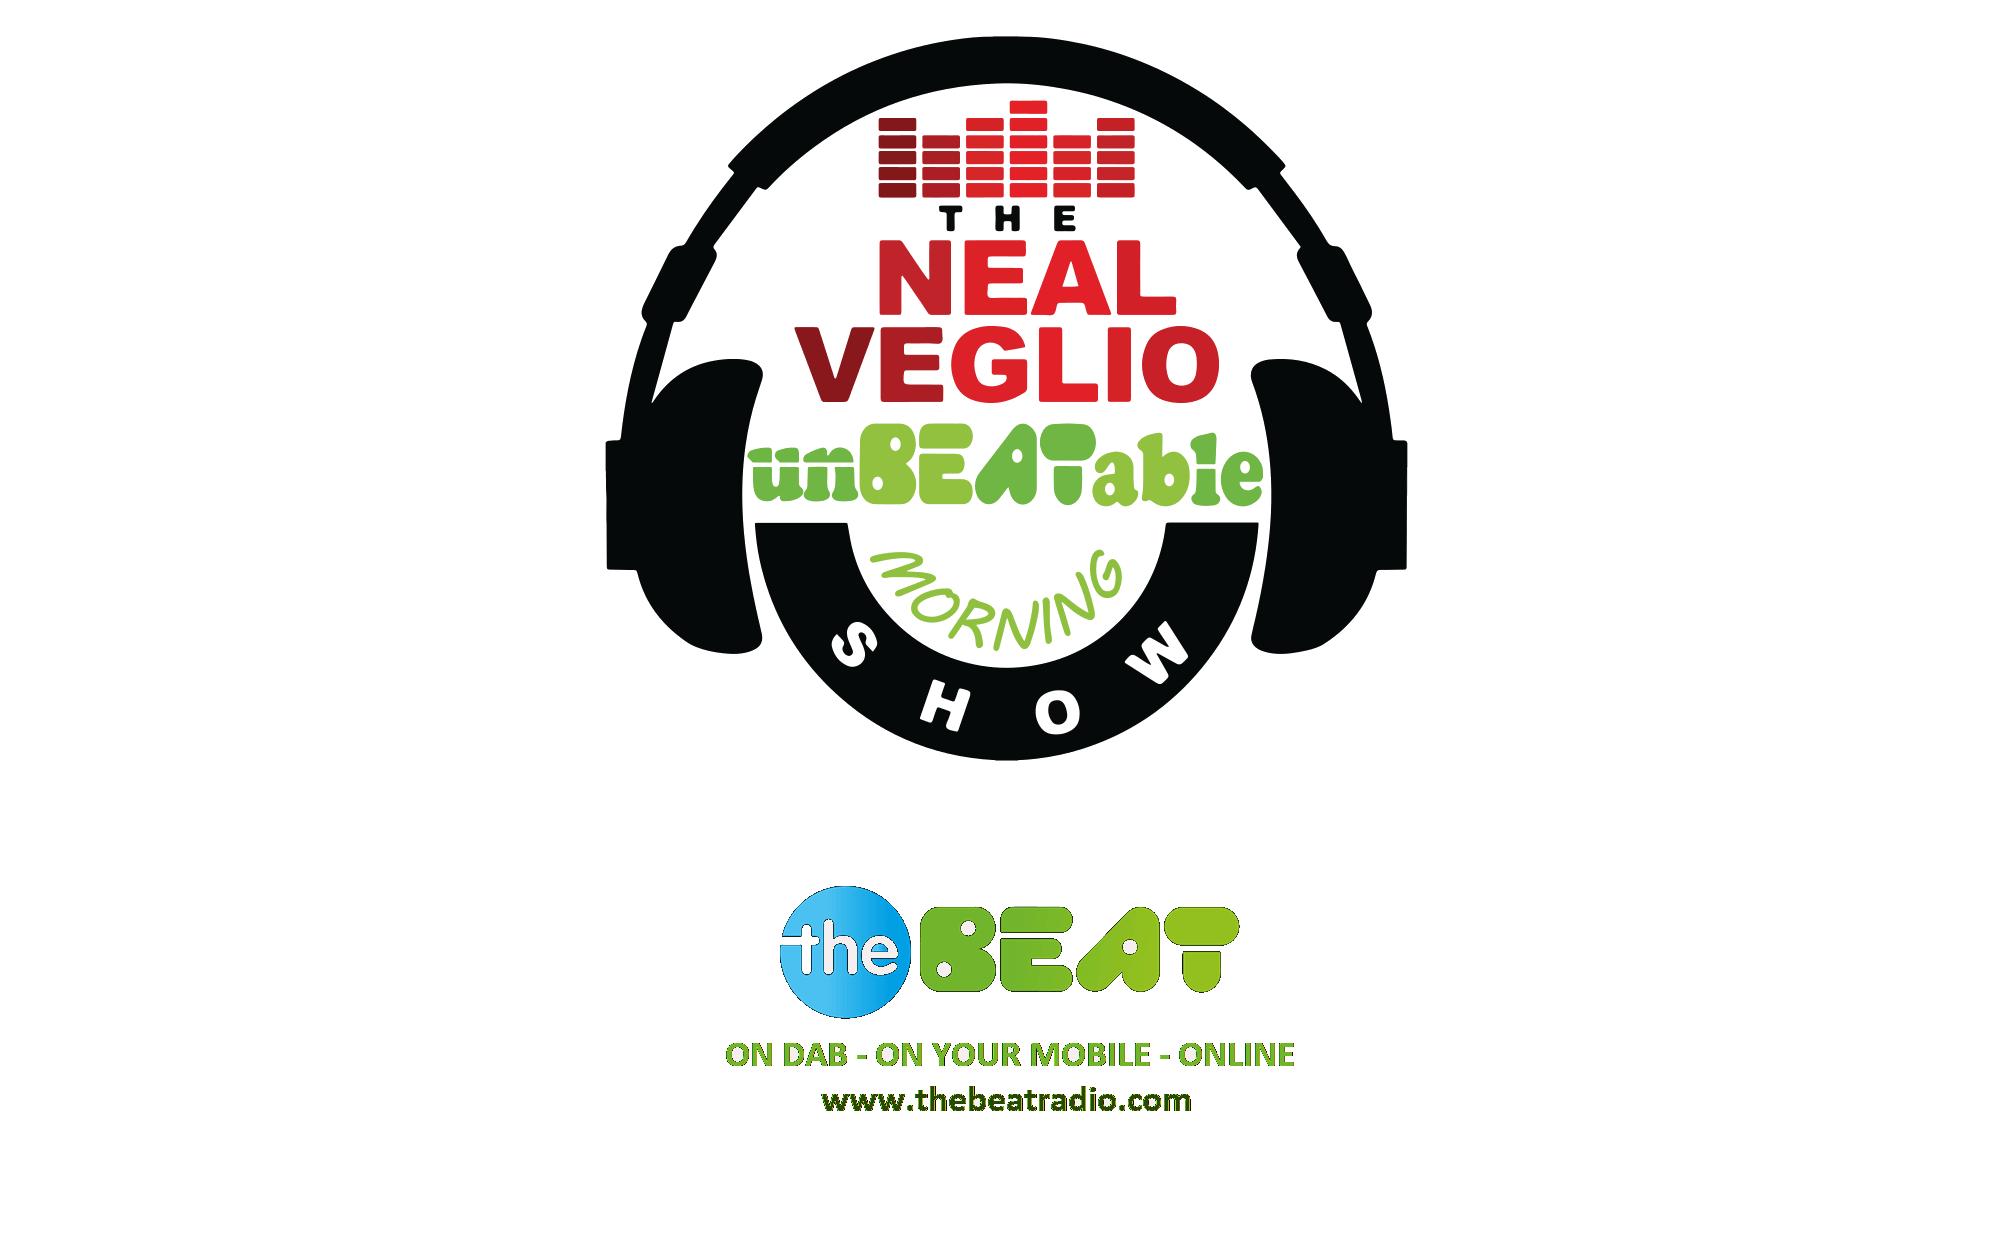 Meet Neal Veglio